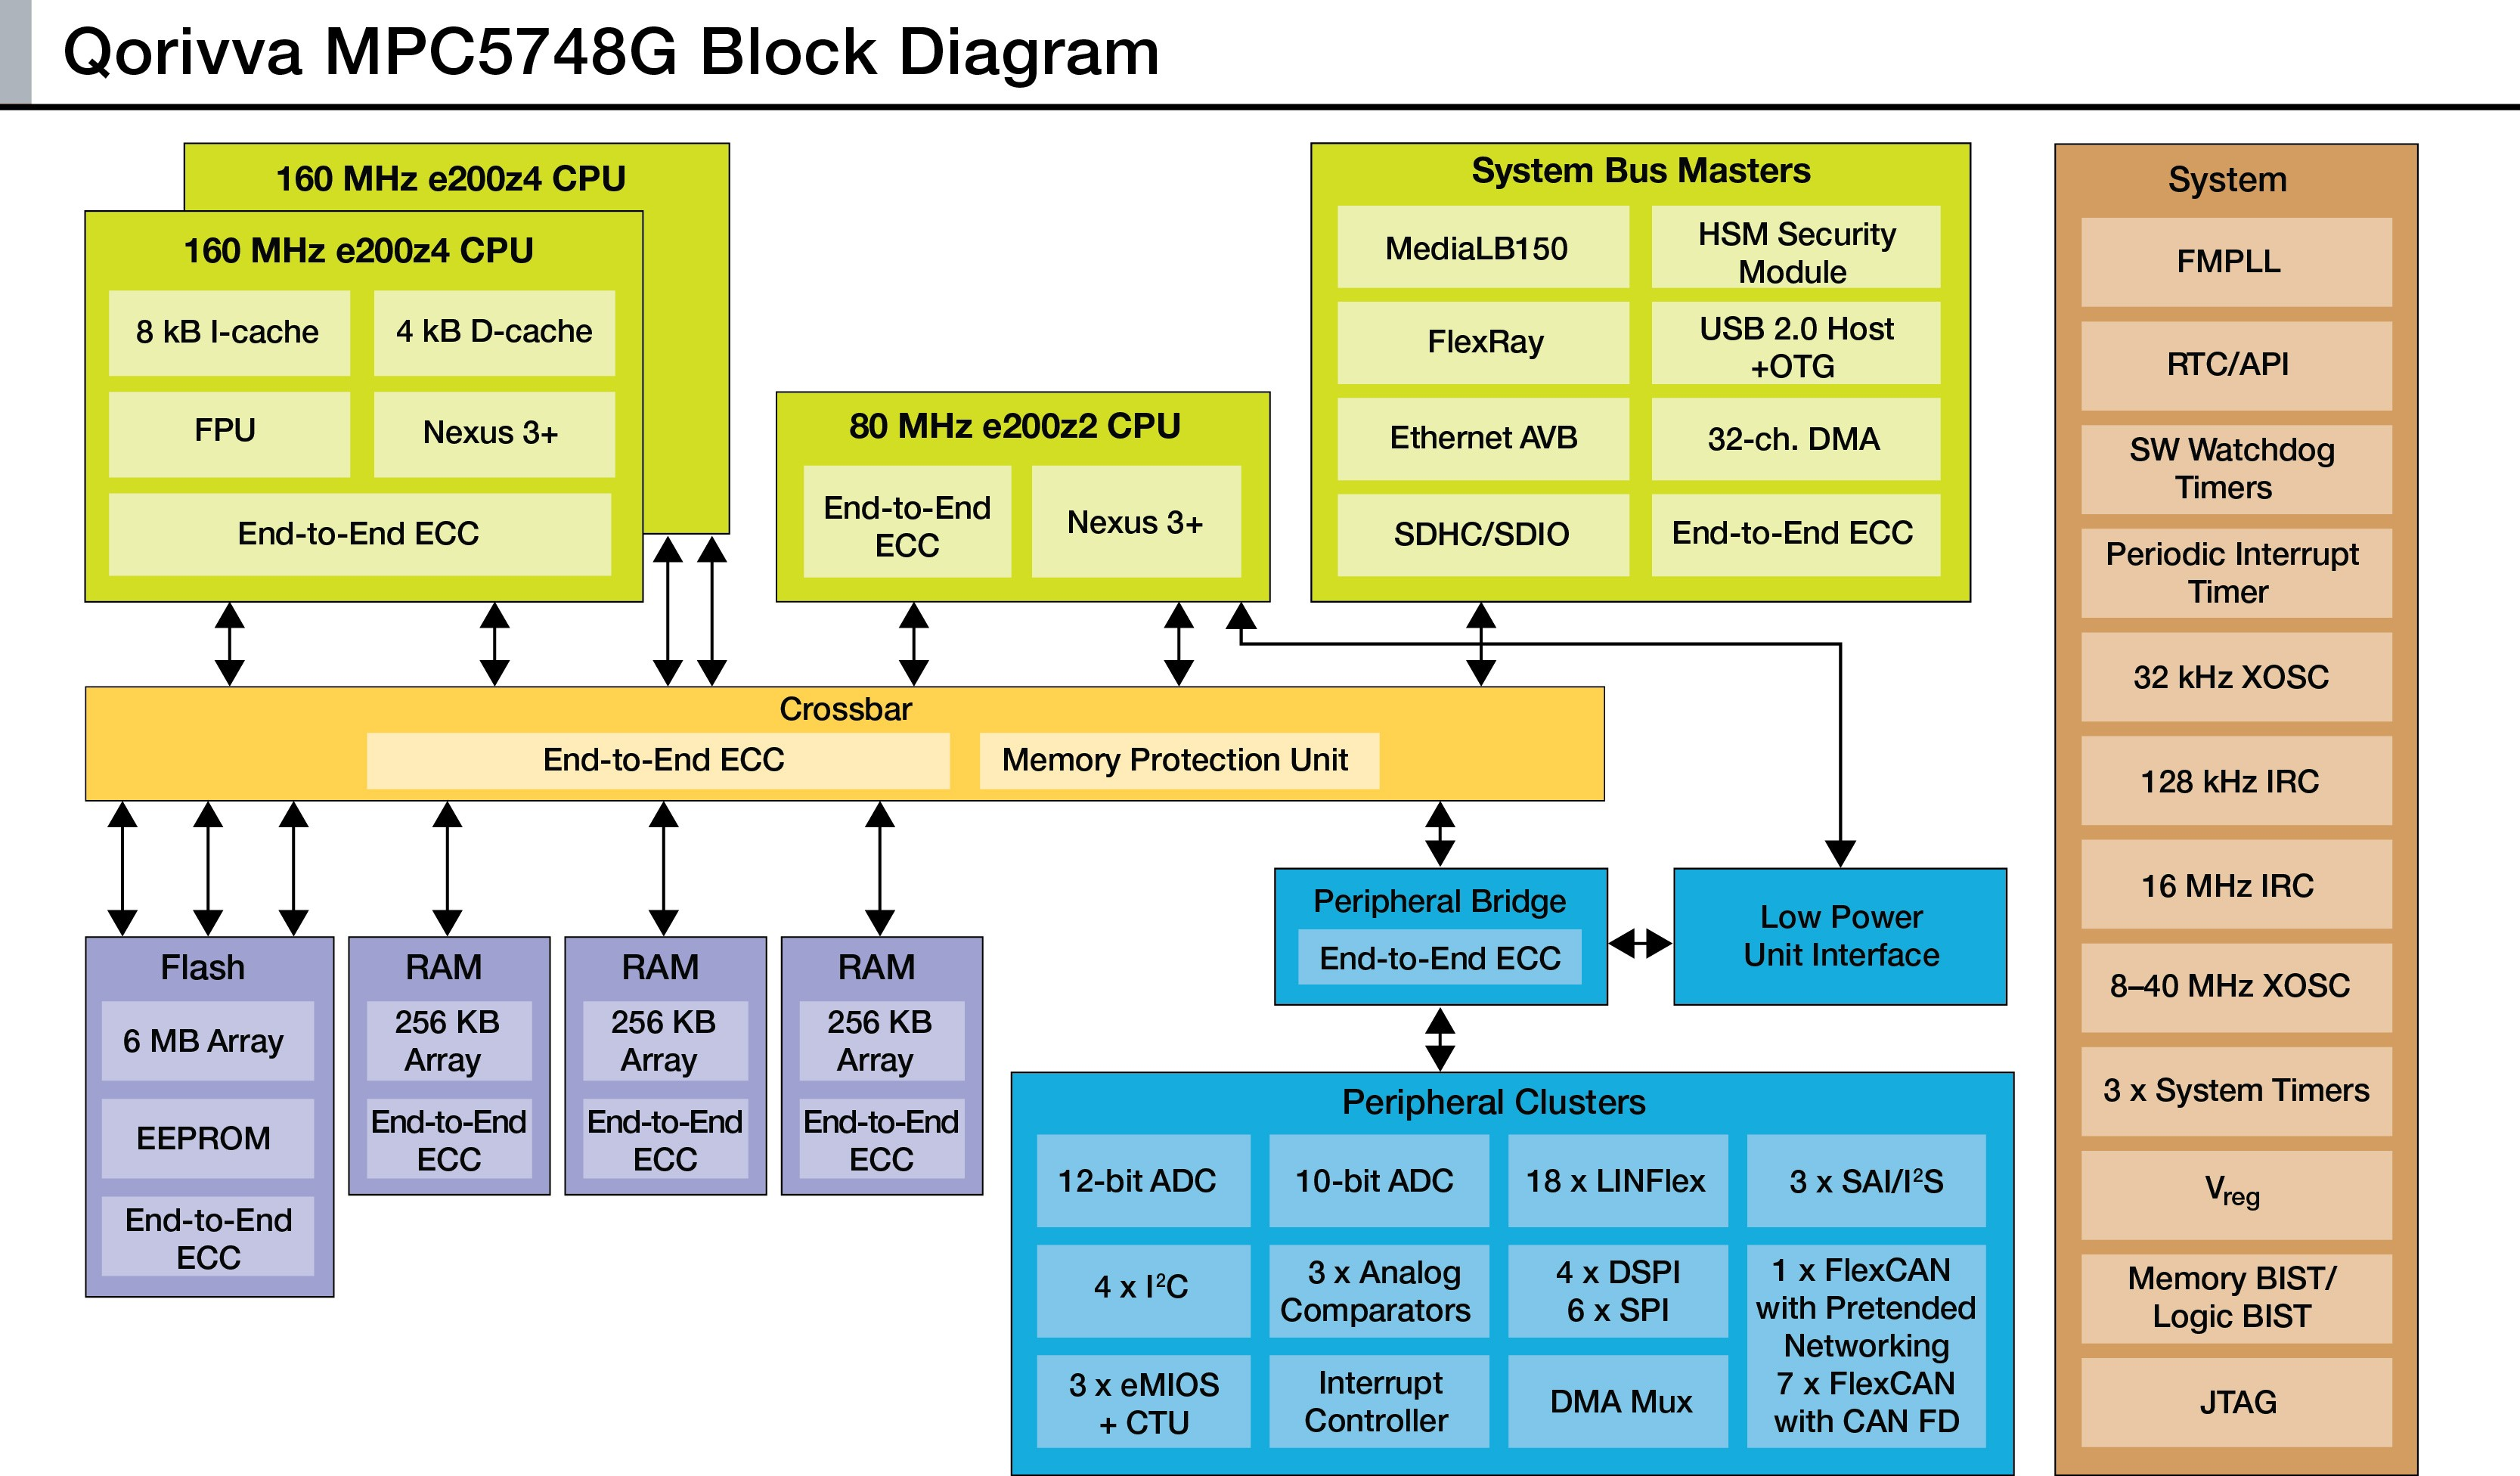 Car Infotainment System Block Diagram | My Wiring DIagram